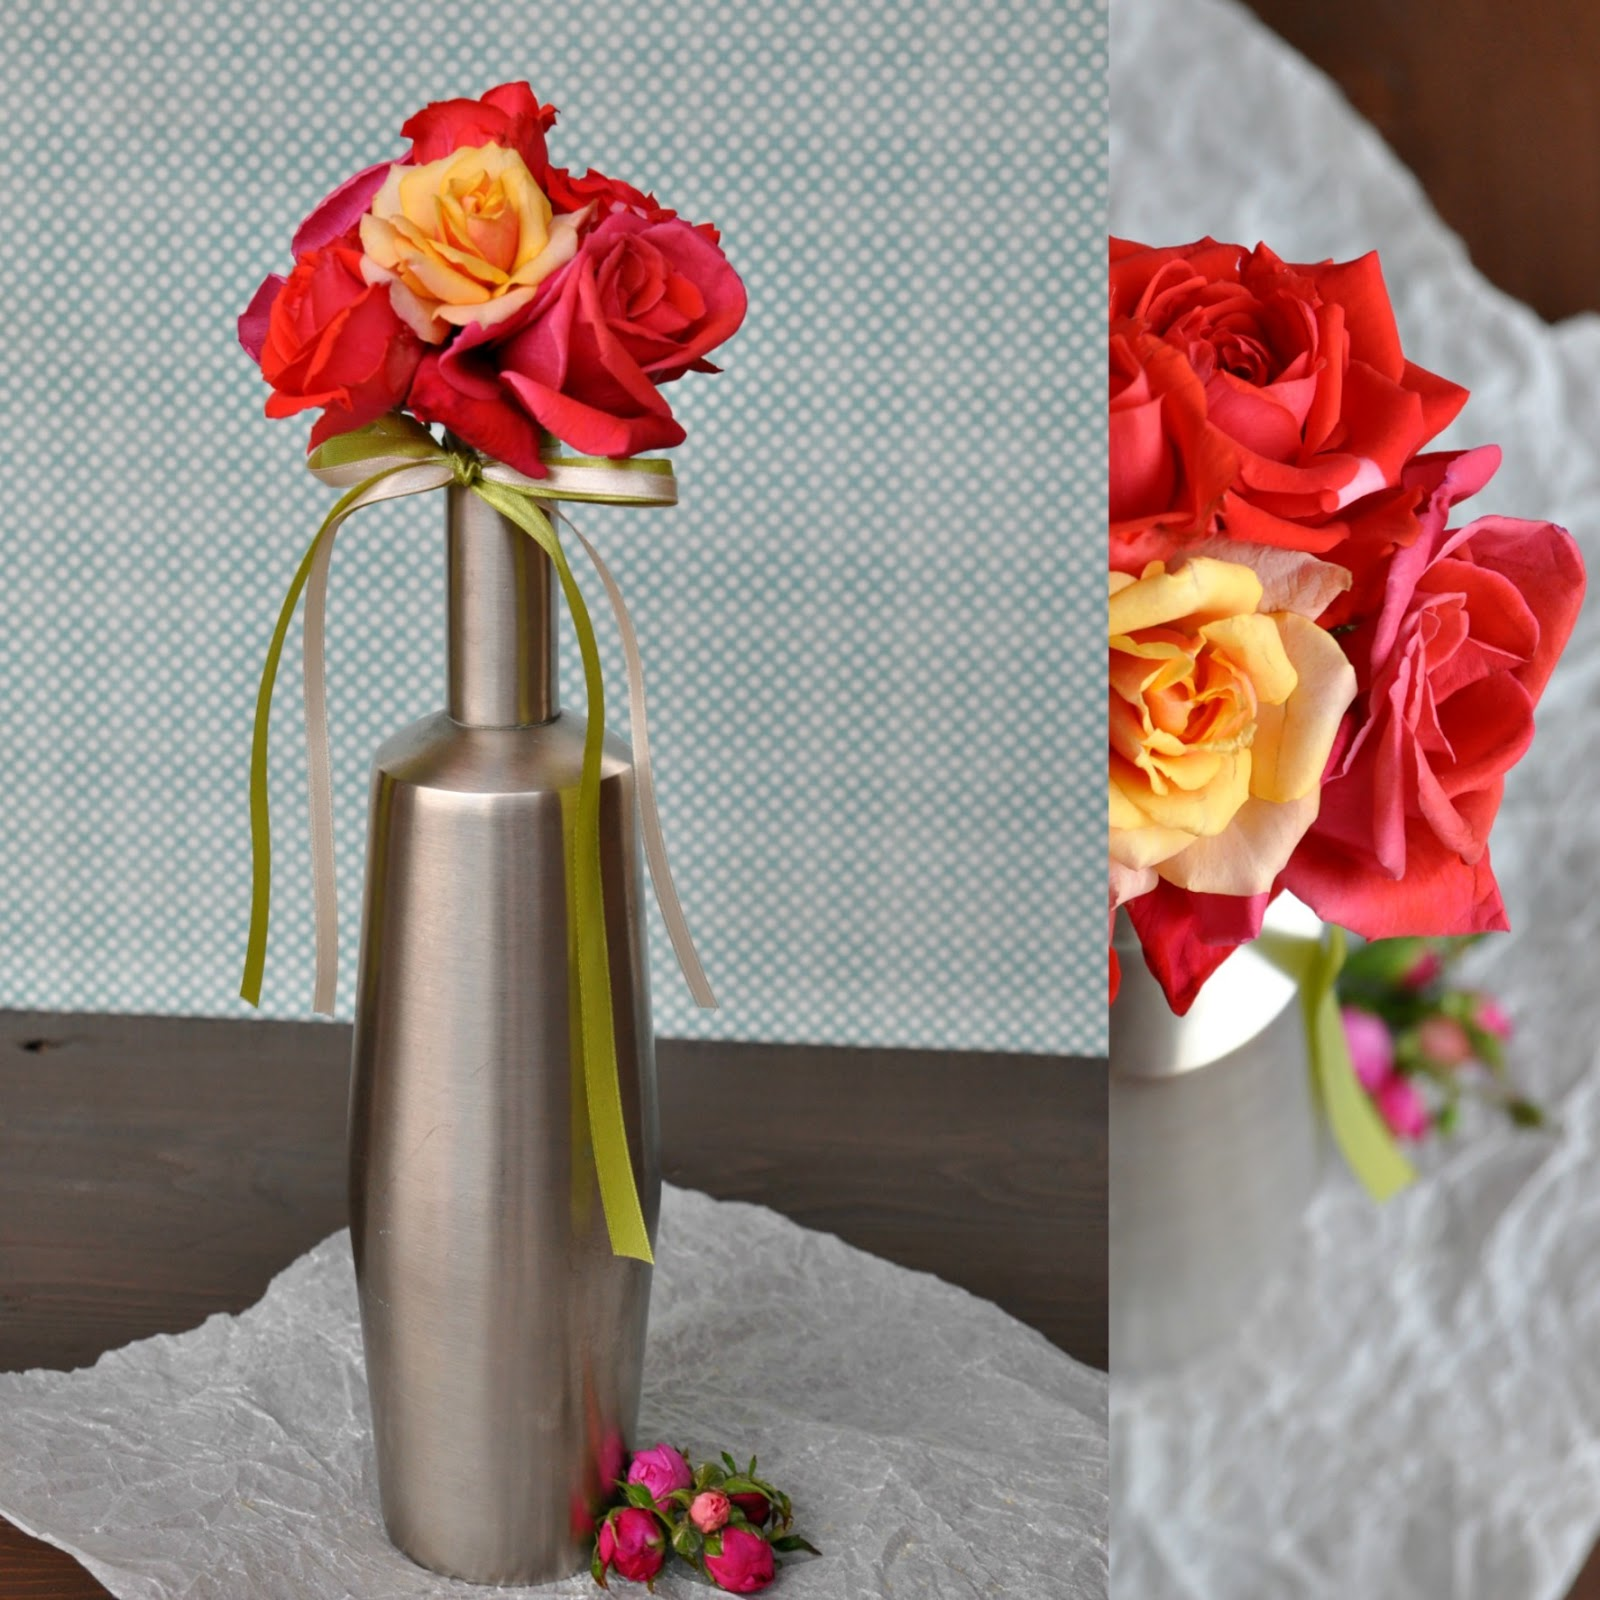 lemapi s dtiroler lifestyleblog rosen aus dem garten. Black Bedroom Furniture Sets. Home Design Ideas